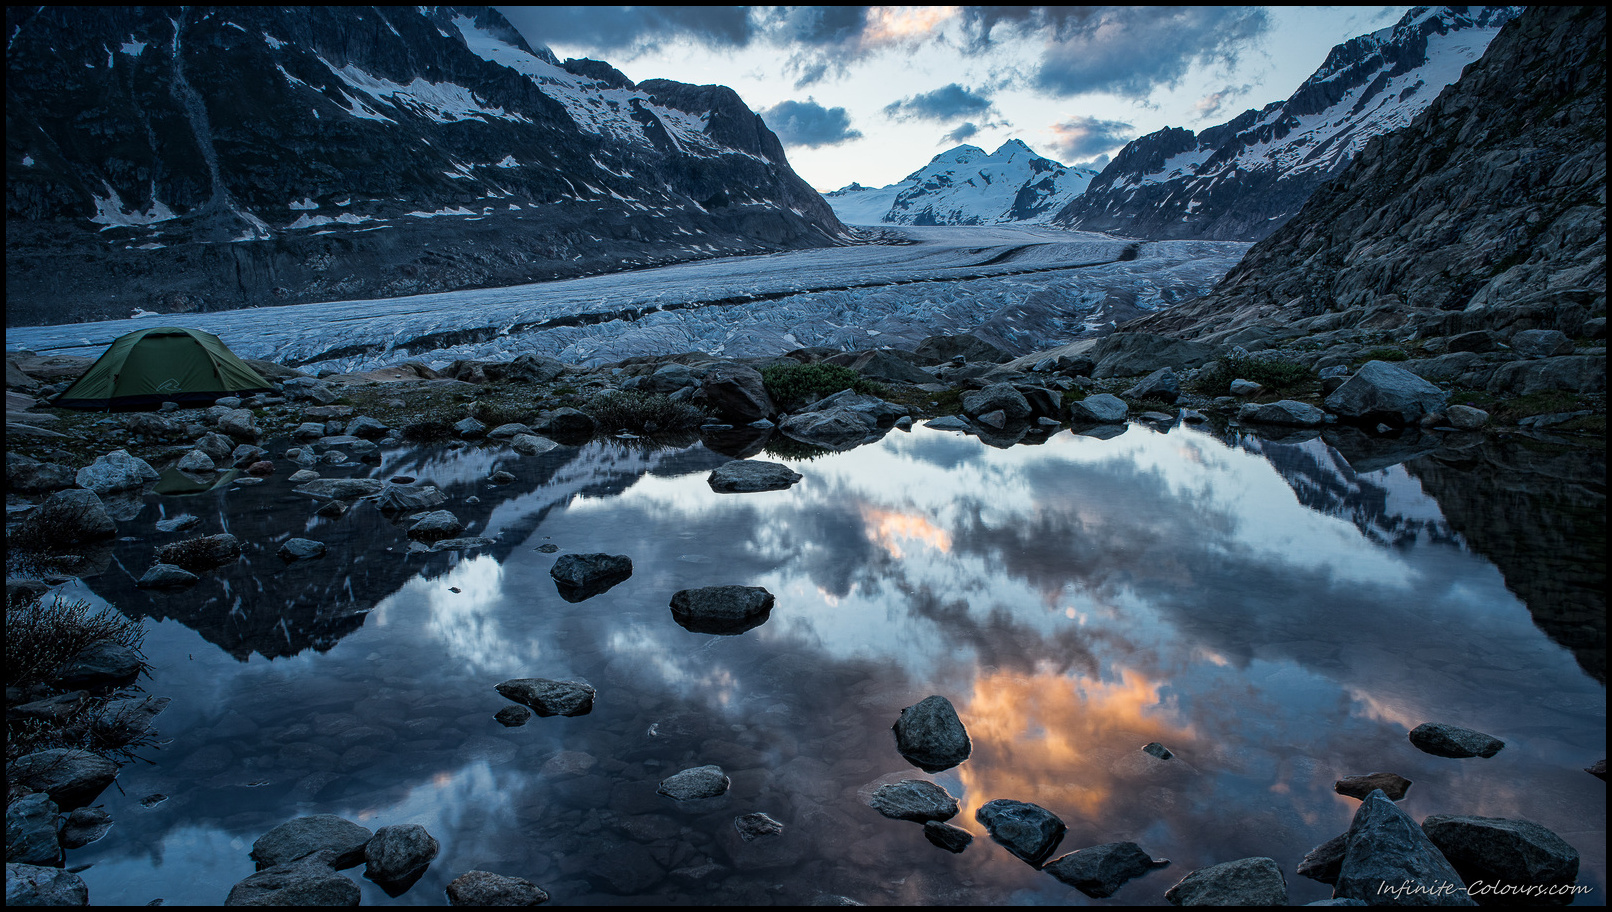 Jungfrau Aletsch glacier camp III